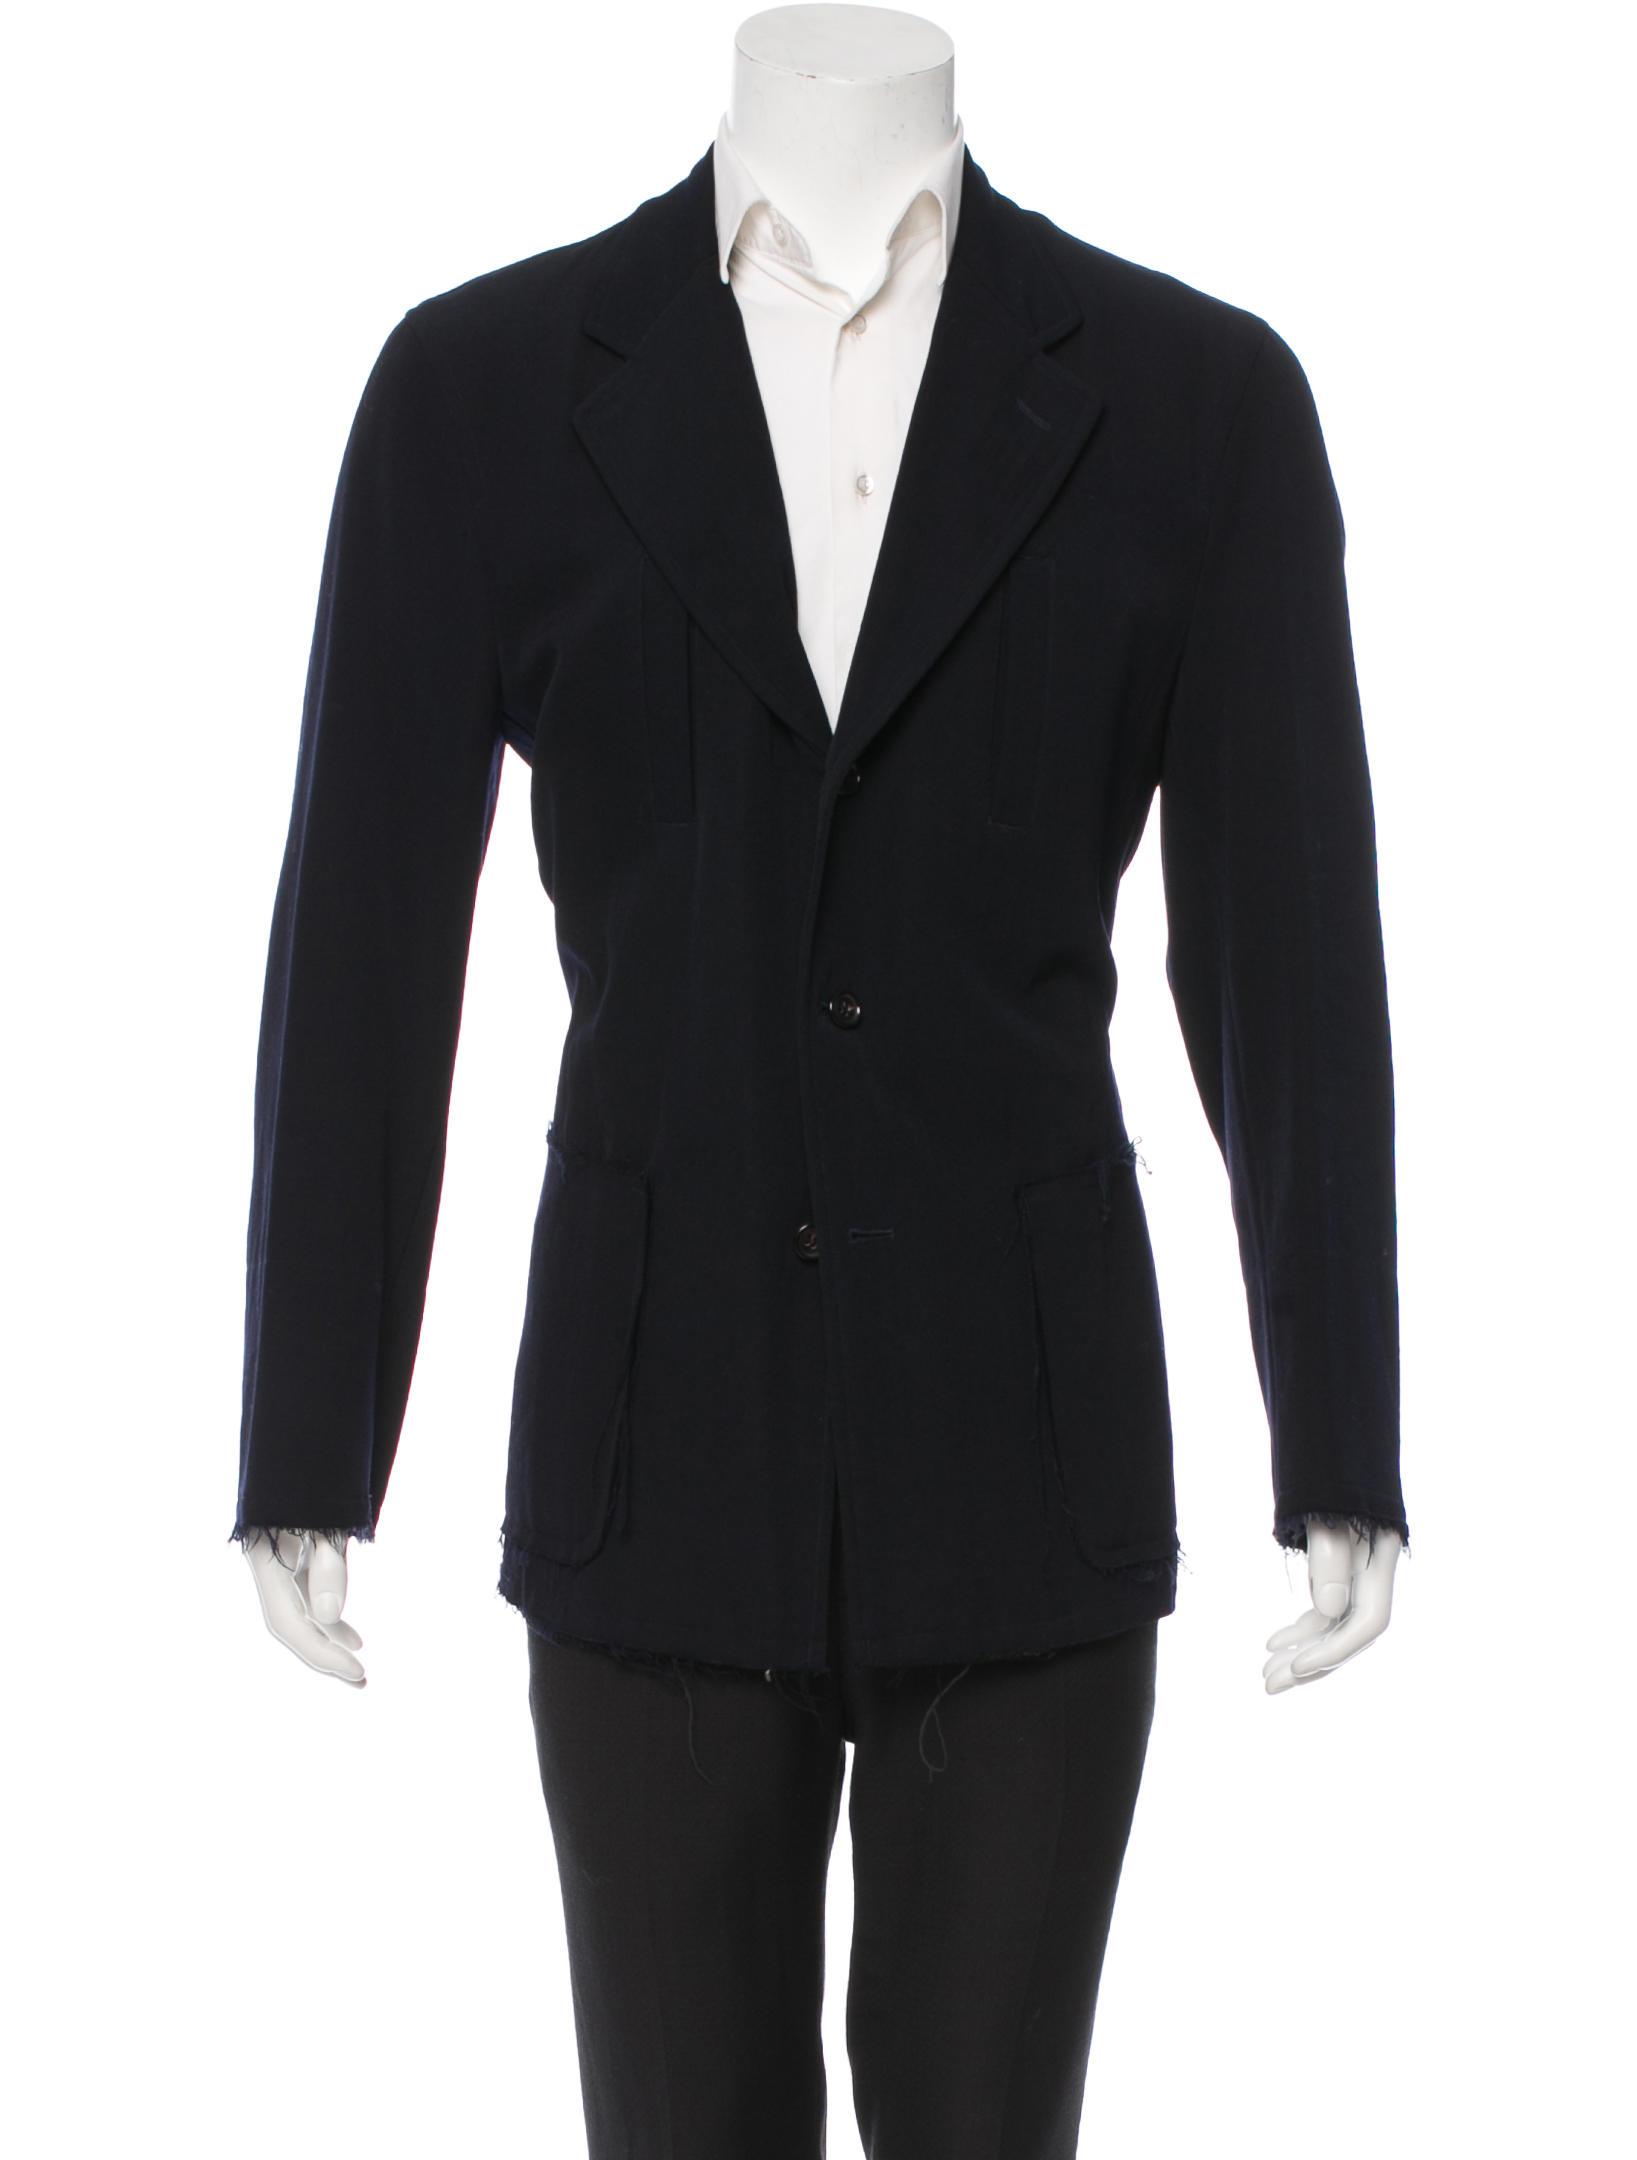 Light-weight wool jacket